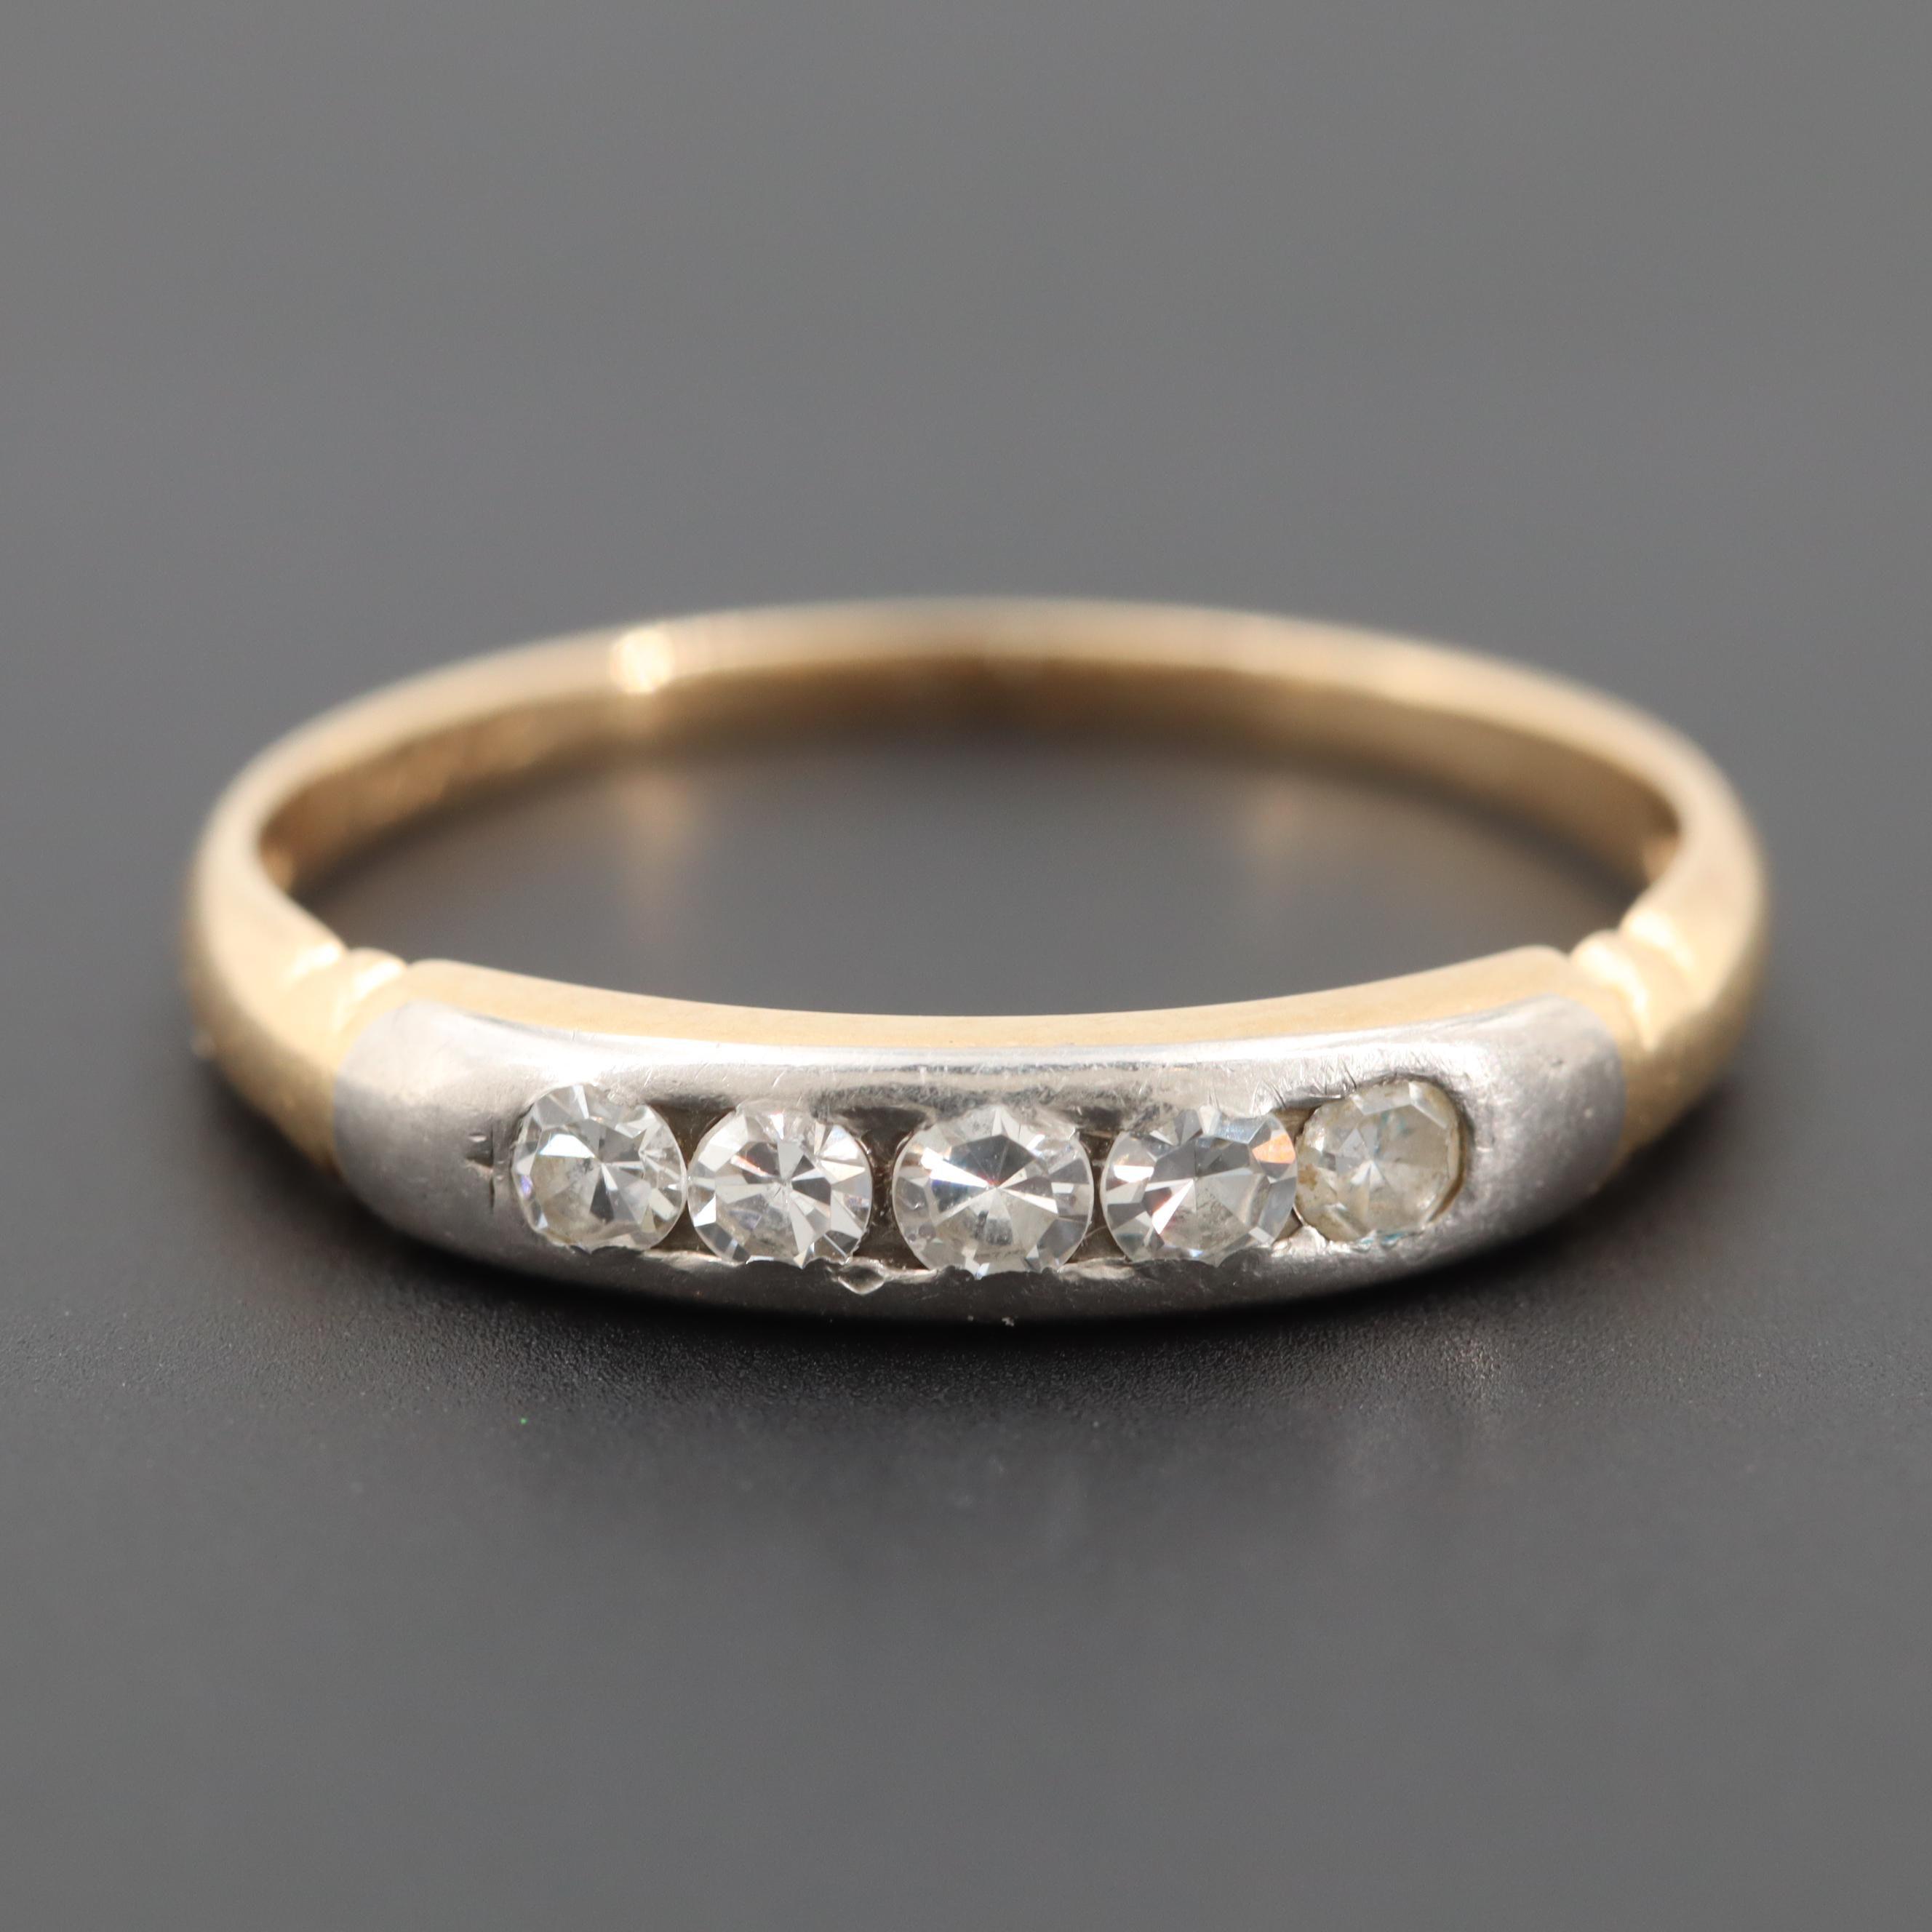 14K Yellow Gold Diamond Ring with Palladium Crown